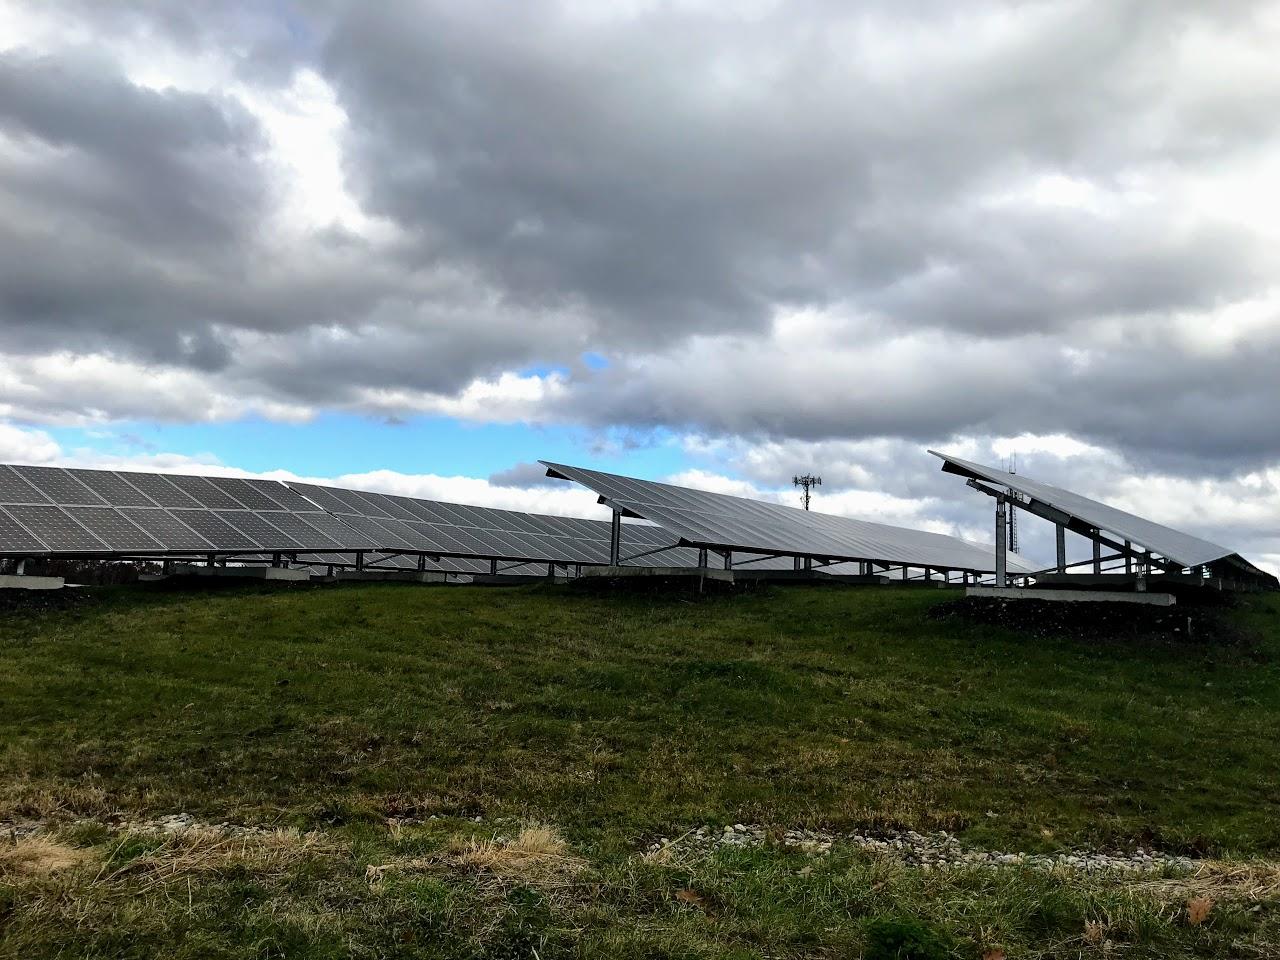 Rhode Island Must Pass Legislation on Solar Siting This Year